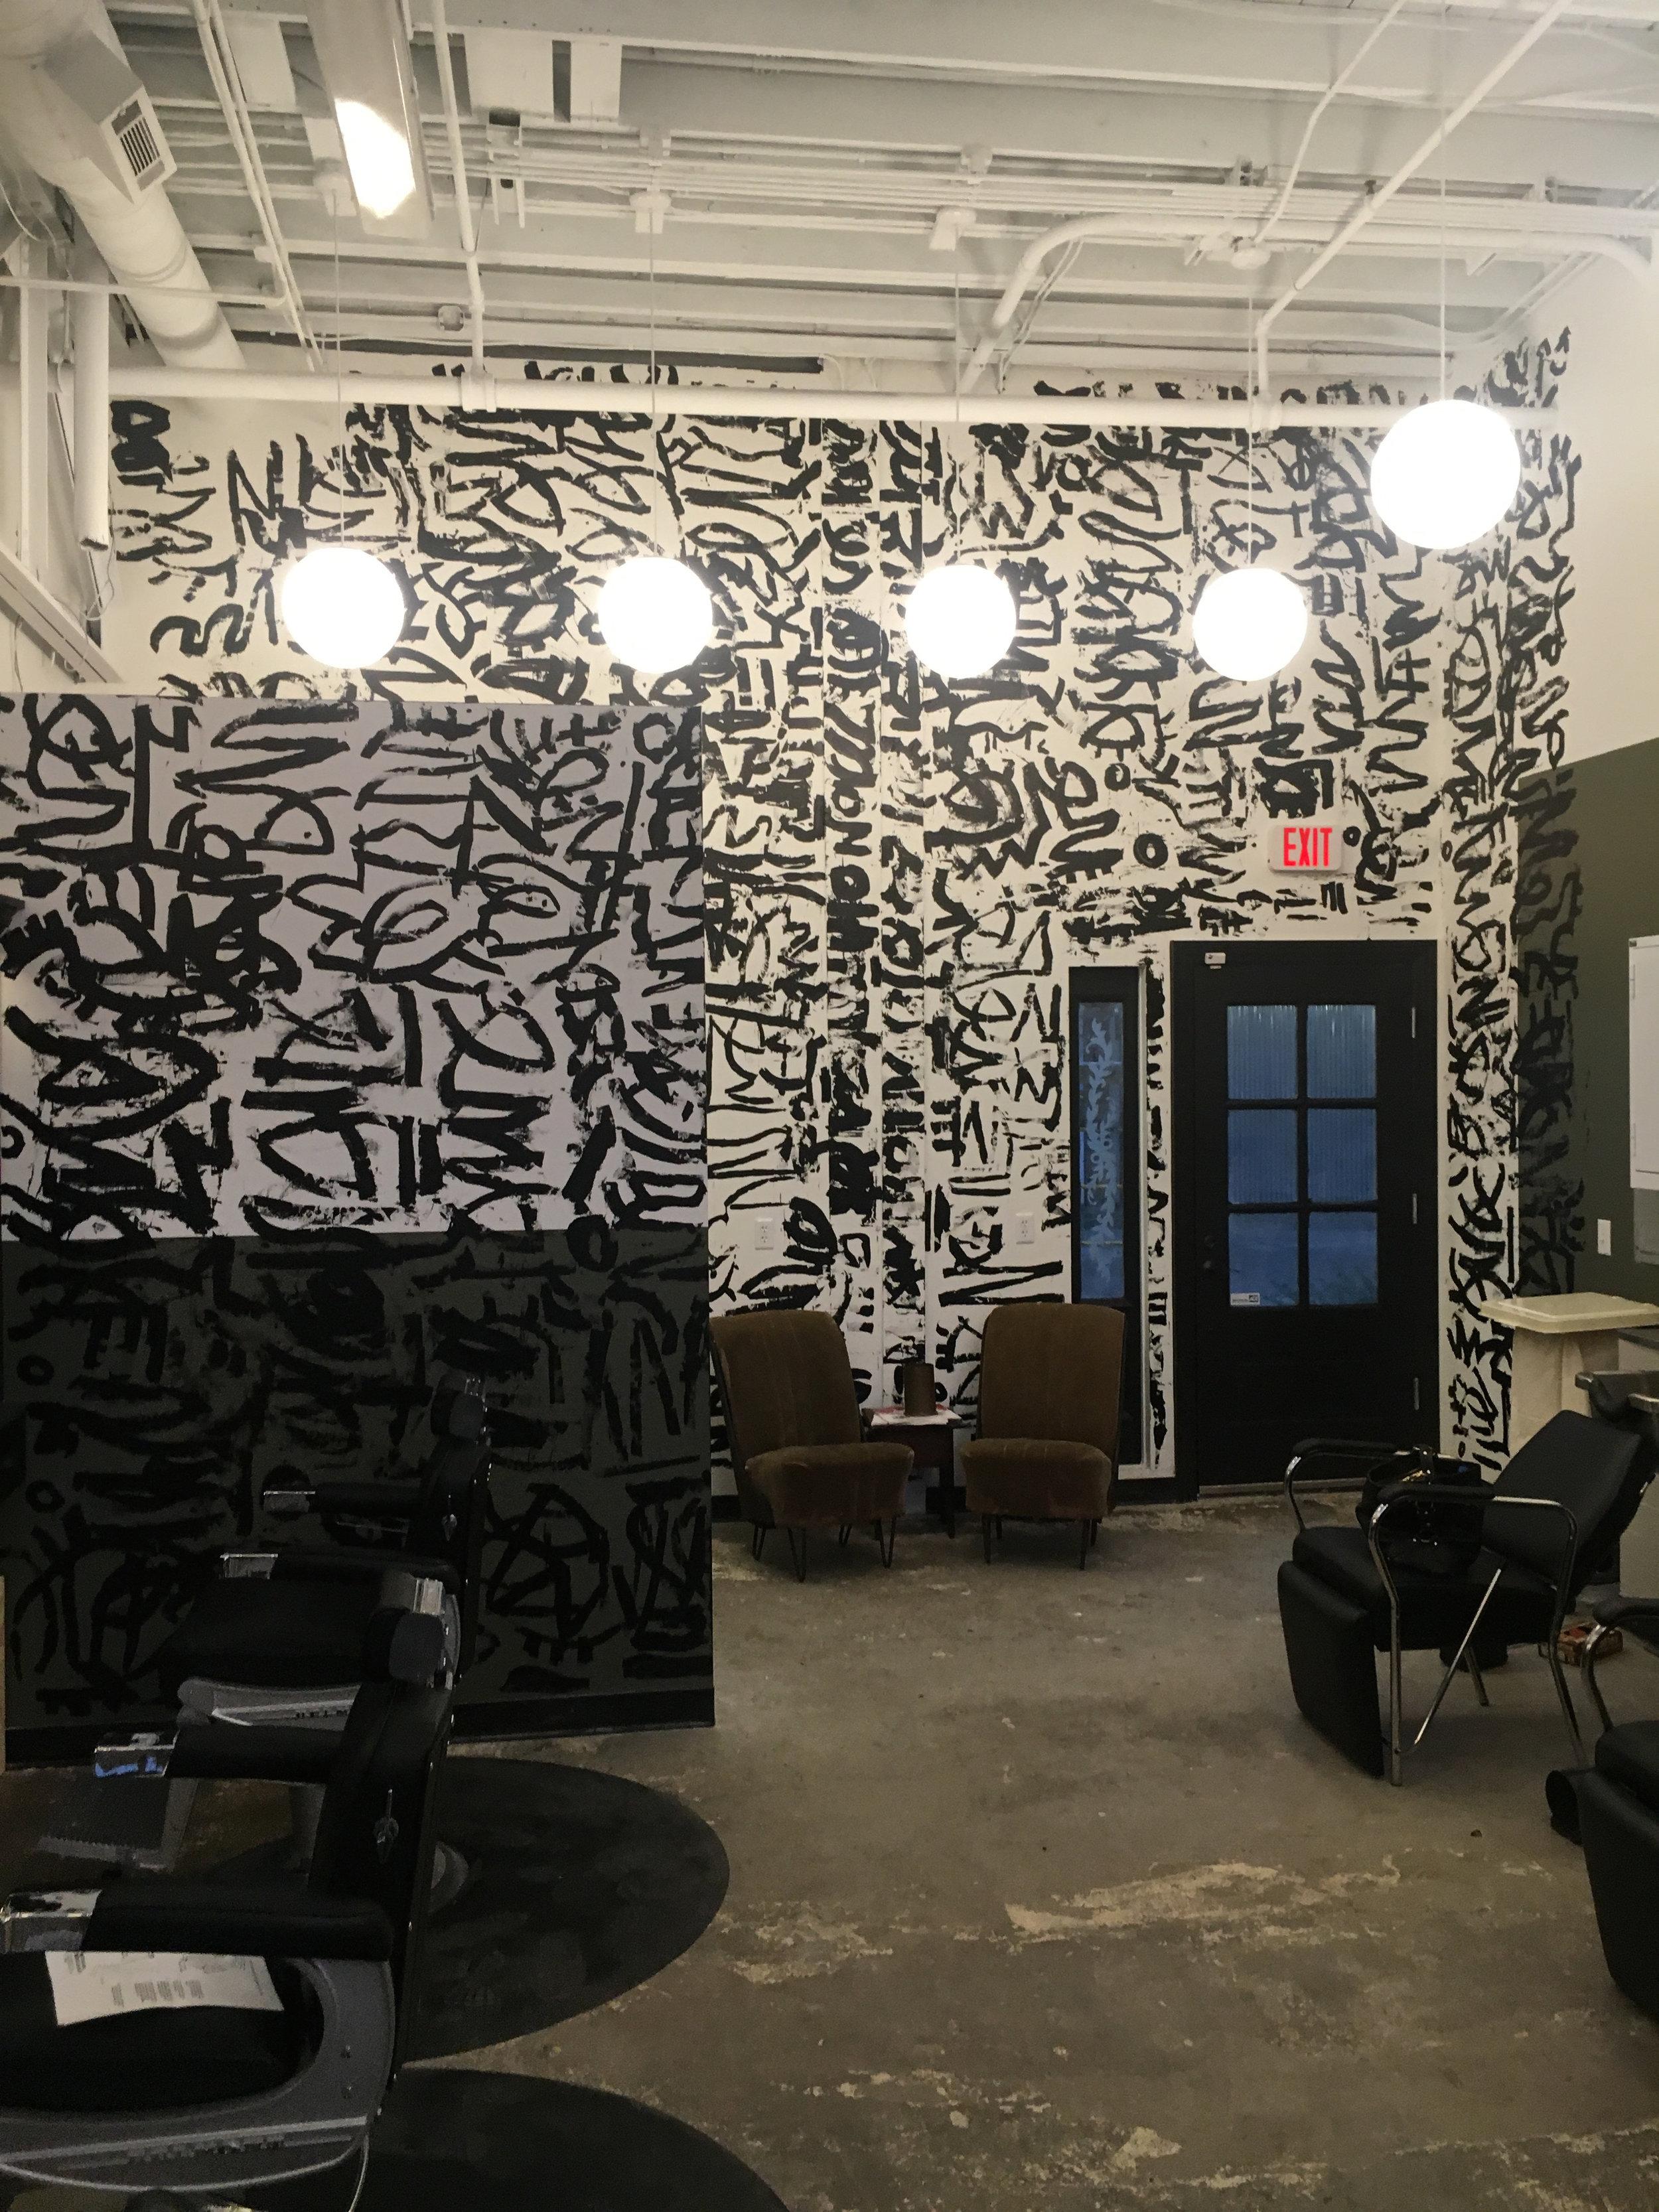 Rudy's Barbershop. Nashville, Tennessee